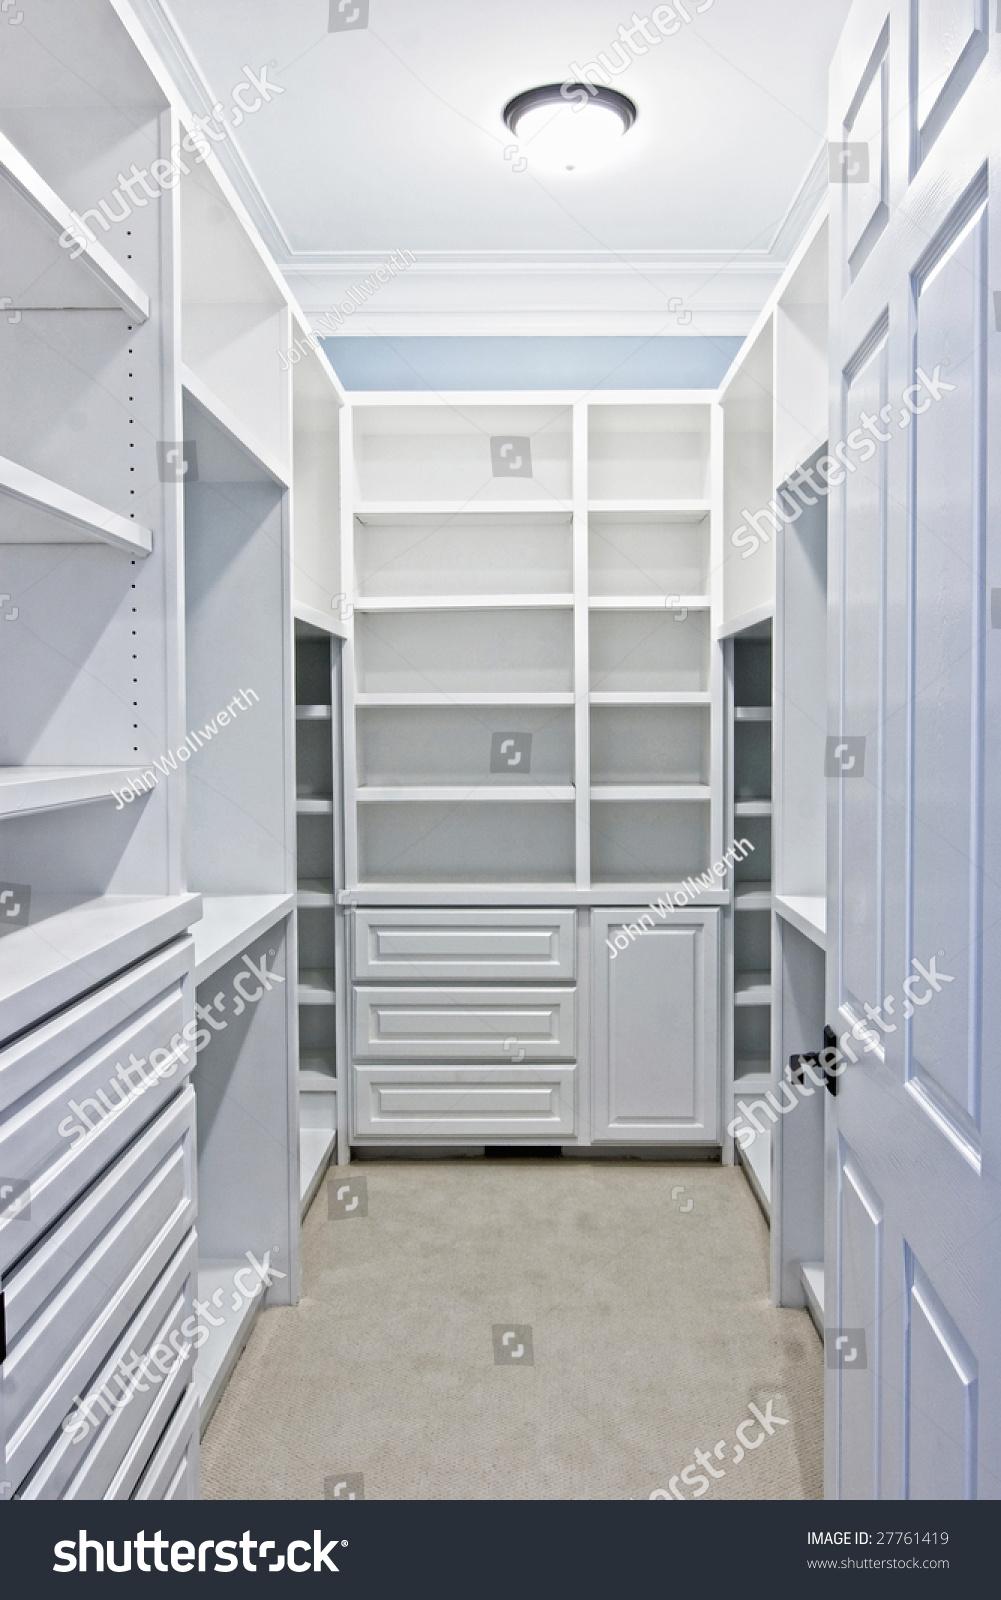 Large white walkin closet shelves stock photo 27761419 for Walk in closet white